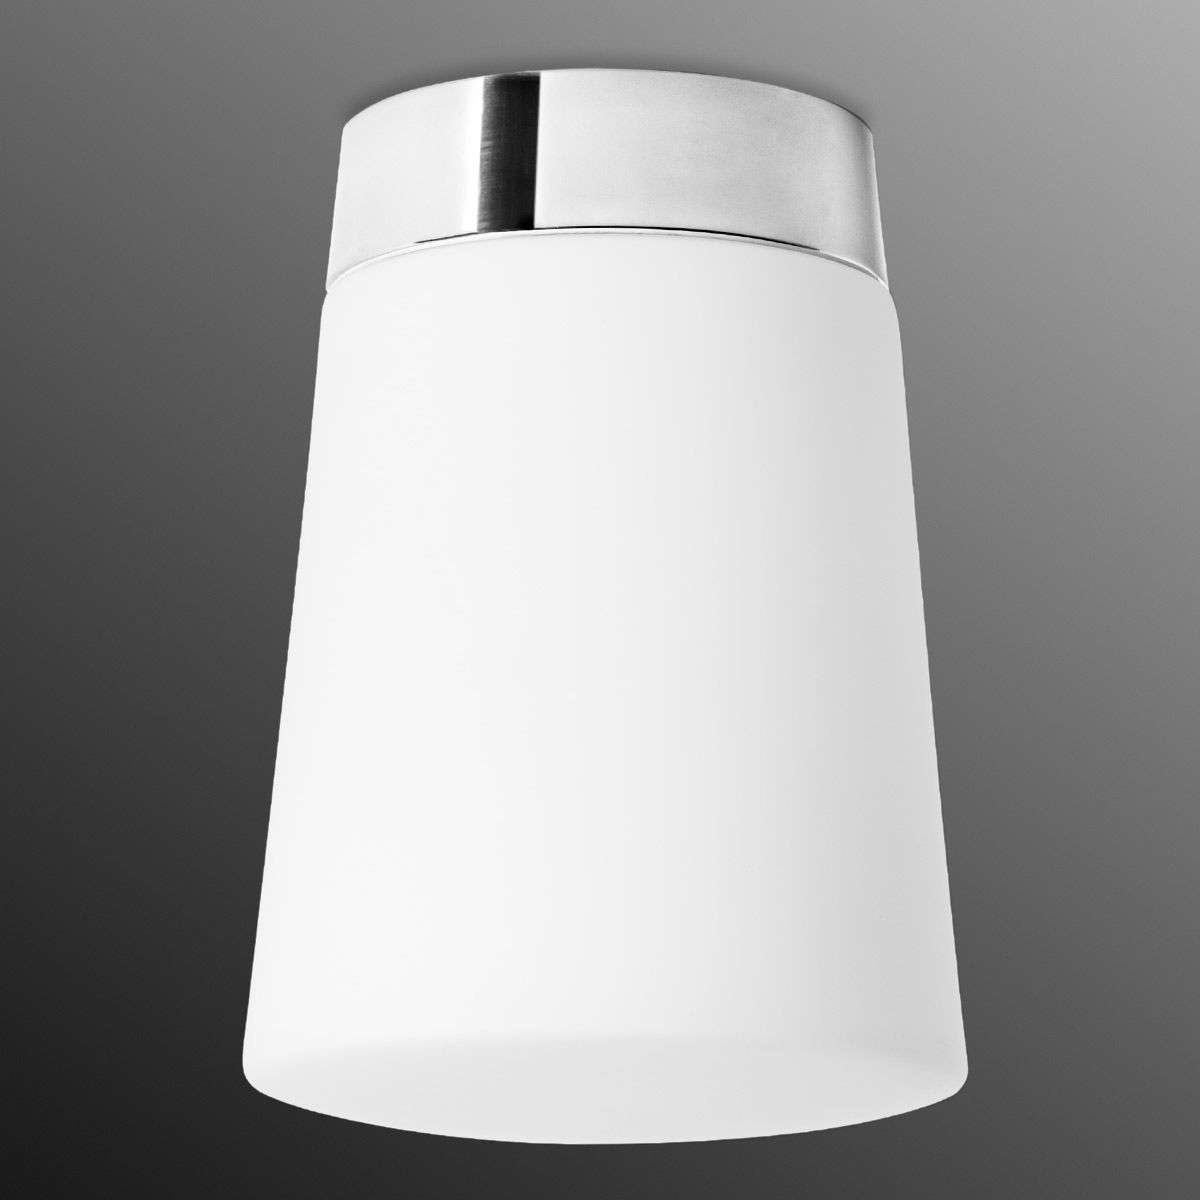 Bathroom ceiling lamp bob ip44 lights bathroom ceiling lamp bob ip44 6026499 31 aloadofball Image collections